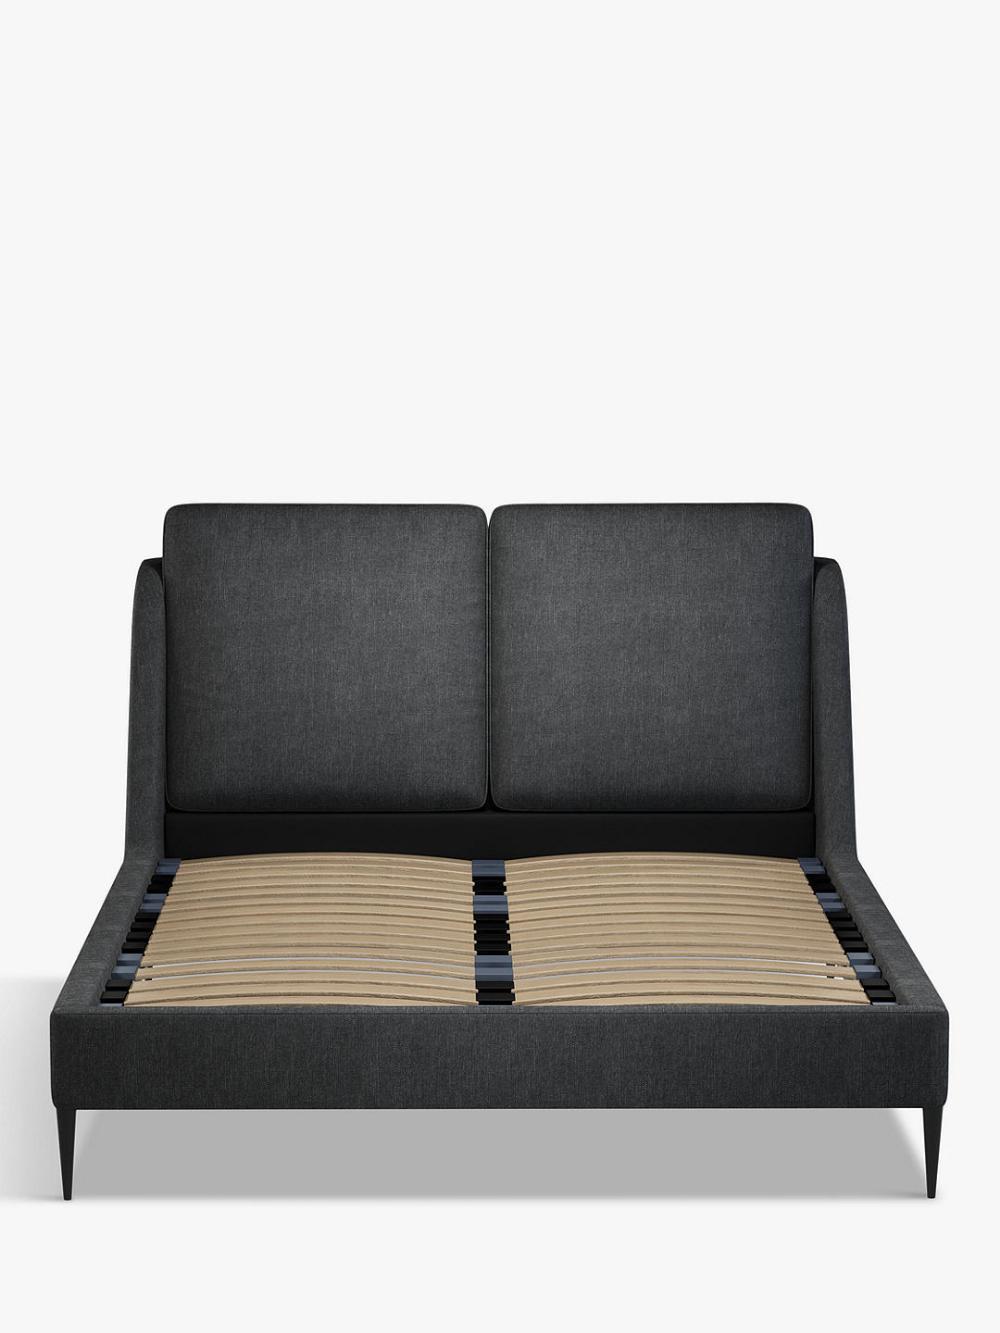 John Lewis & Partners Upholstered Bed Frame, King